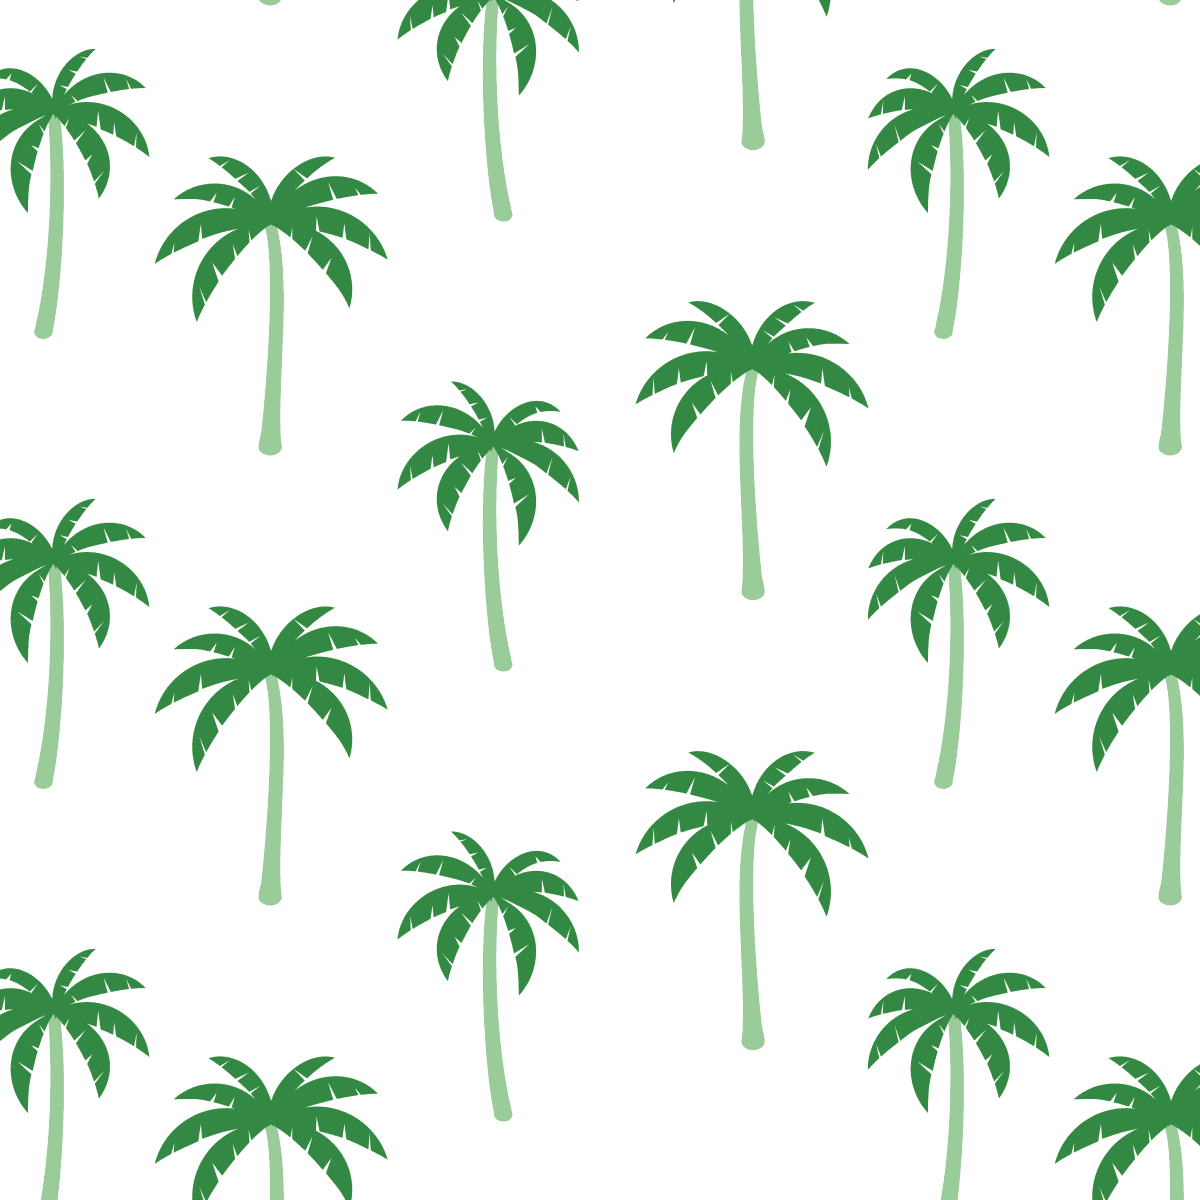 Original paper card palmtree illustration tropical pattern